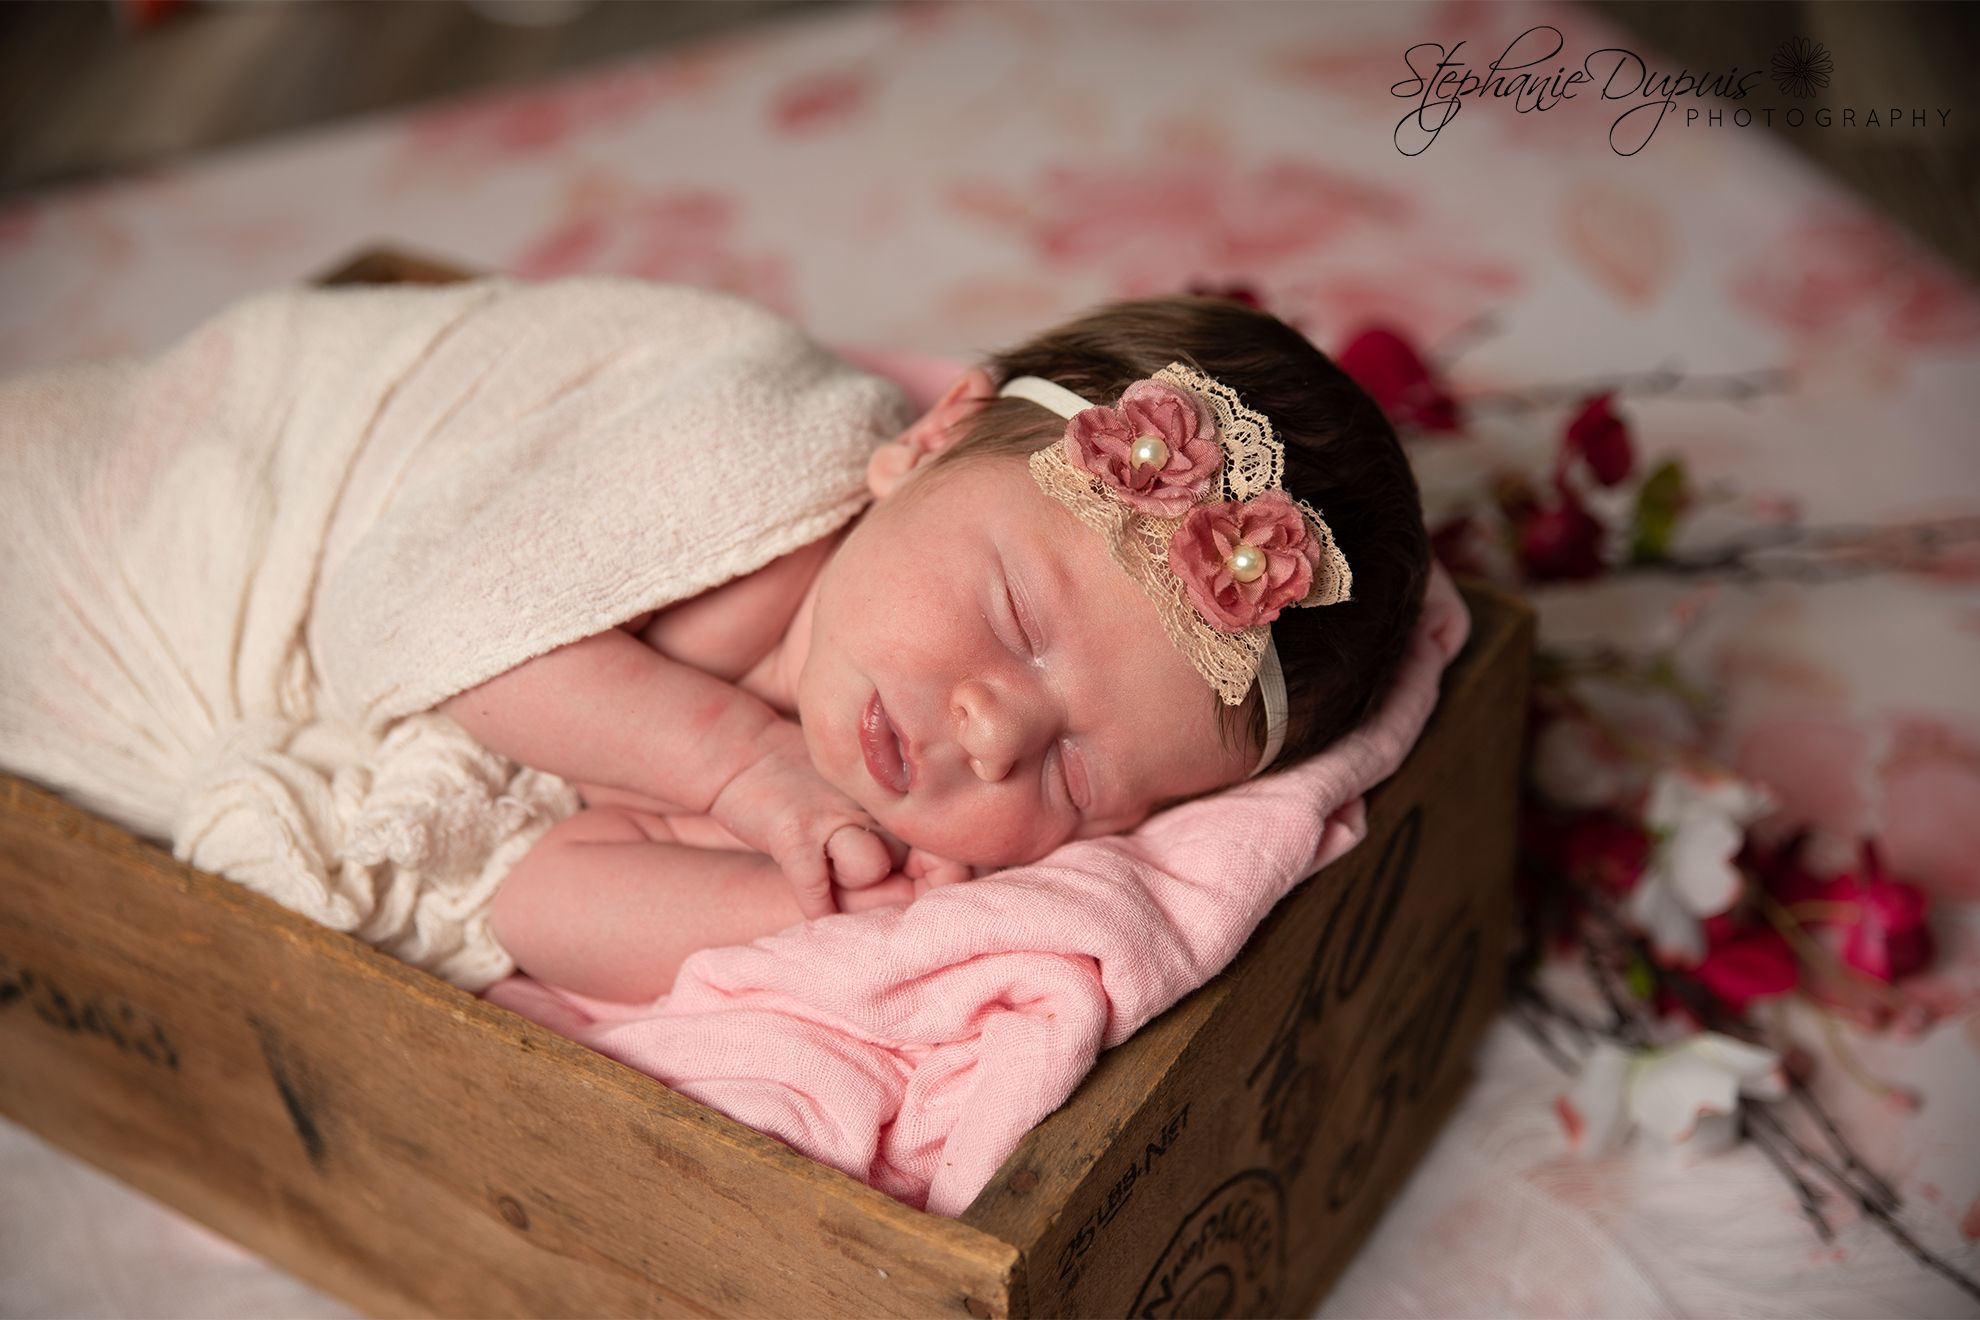 Trisha Eckherdt Infant 1002 - Portfolio: Rayia - Infant Session